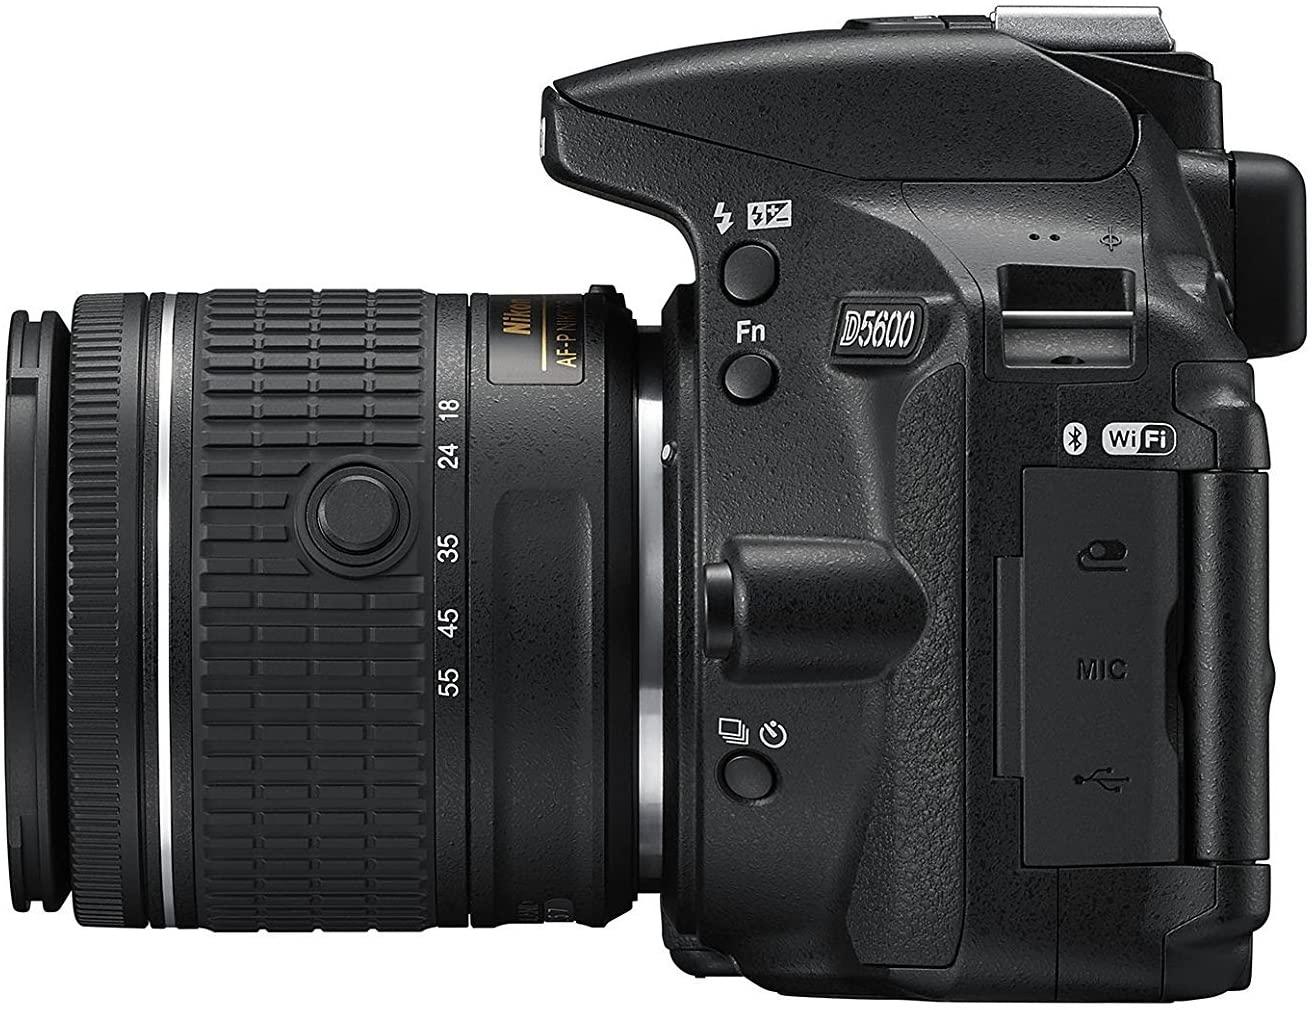 Refurbished Nikon D5600 With 18-55mm Lens